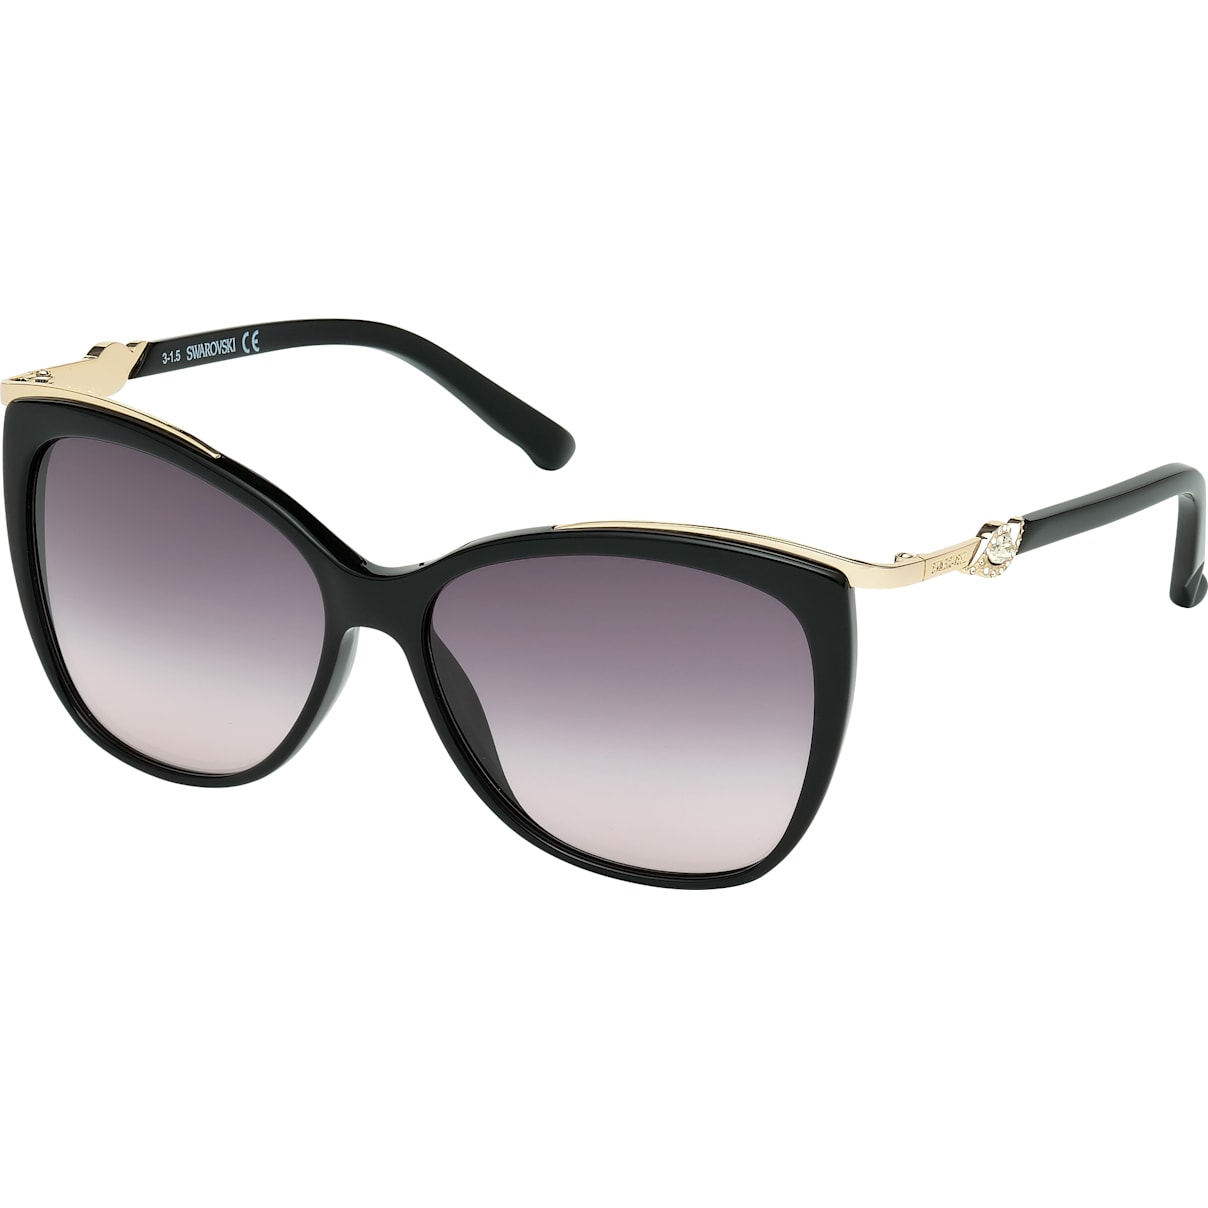 Swarovski Festive Sunglasses, SK0104-F 01B, Black